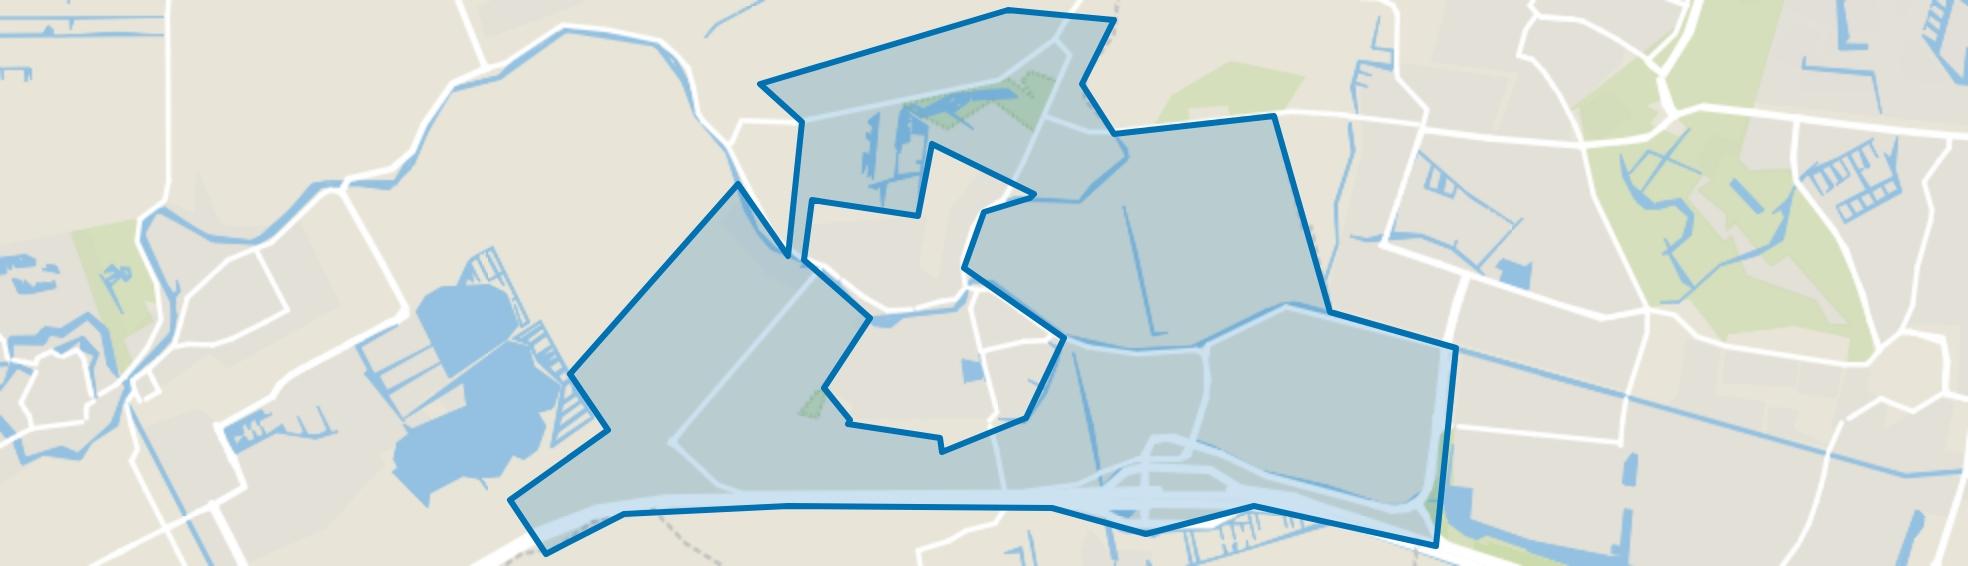 Buitengebied Harmelen, Harmelen map